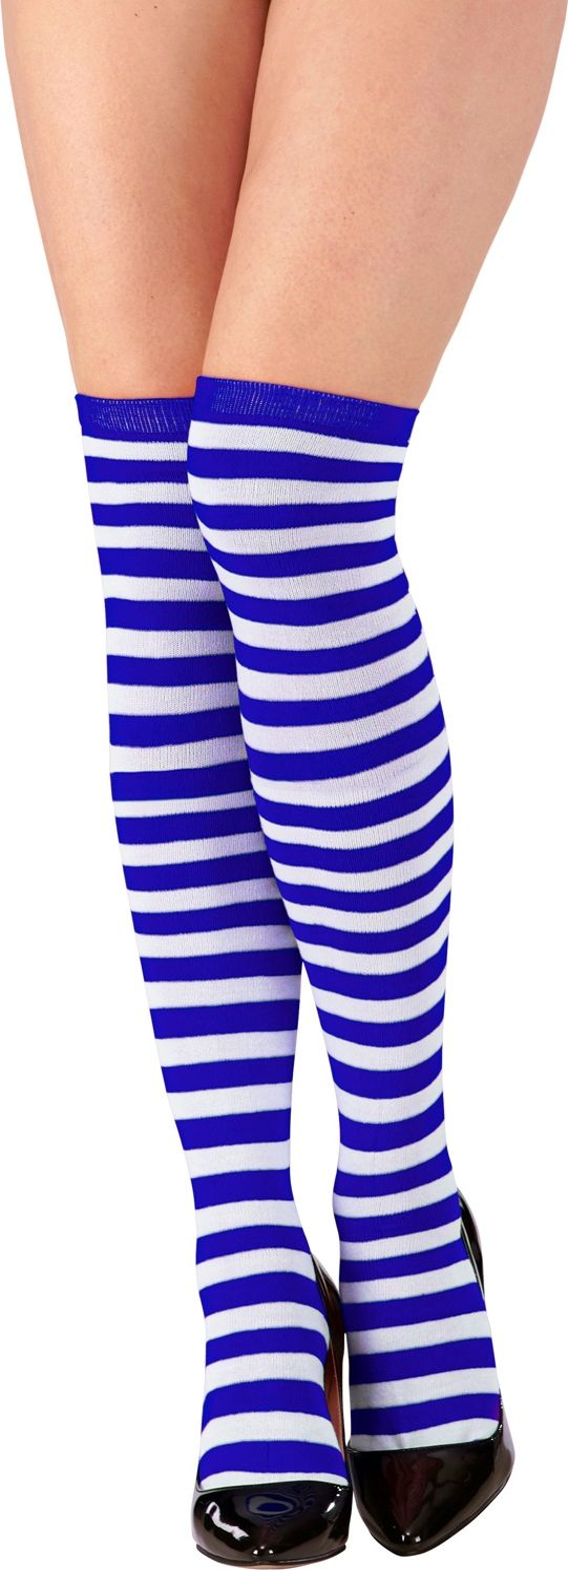 Blauw witte kniekousen Pippi Langkous